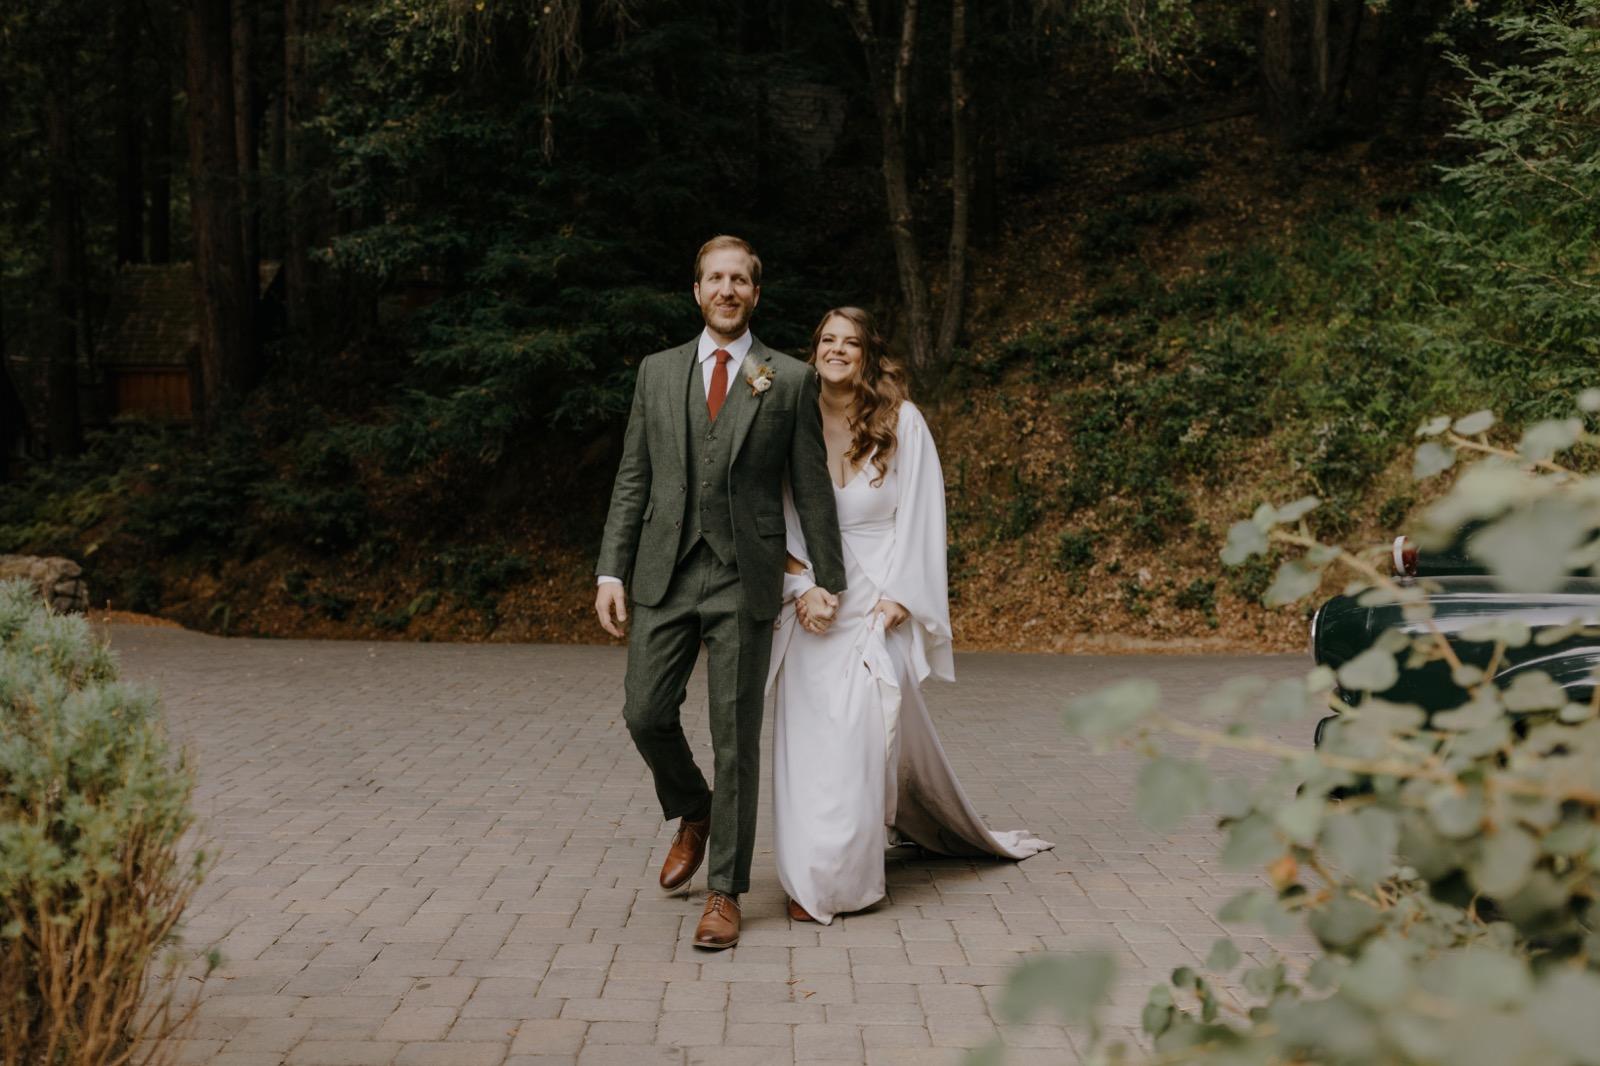 099_E&J (amari) 07299_the-waterfall-lodge_forest_wedding_ben-lomond_intimate